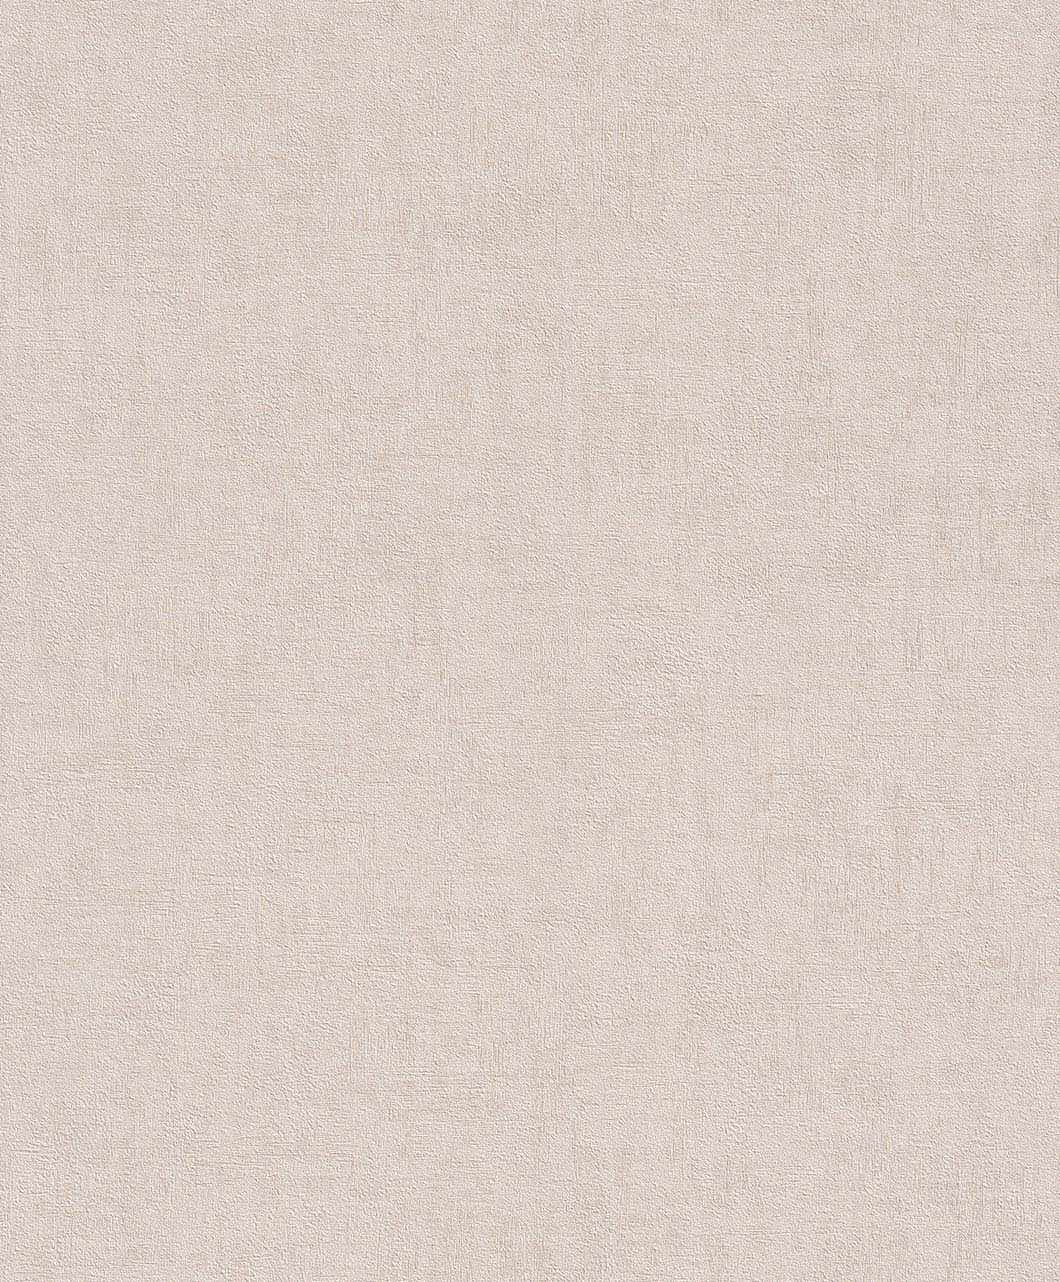 2,99€//1qm Vlies Tapete Uni Einfarbig Rasch Vliestapete graublau 489781